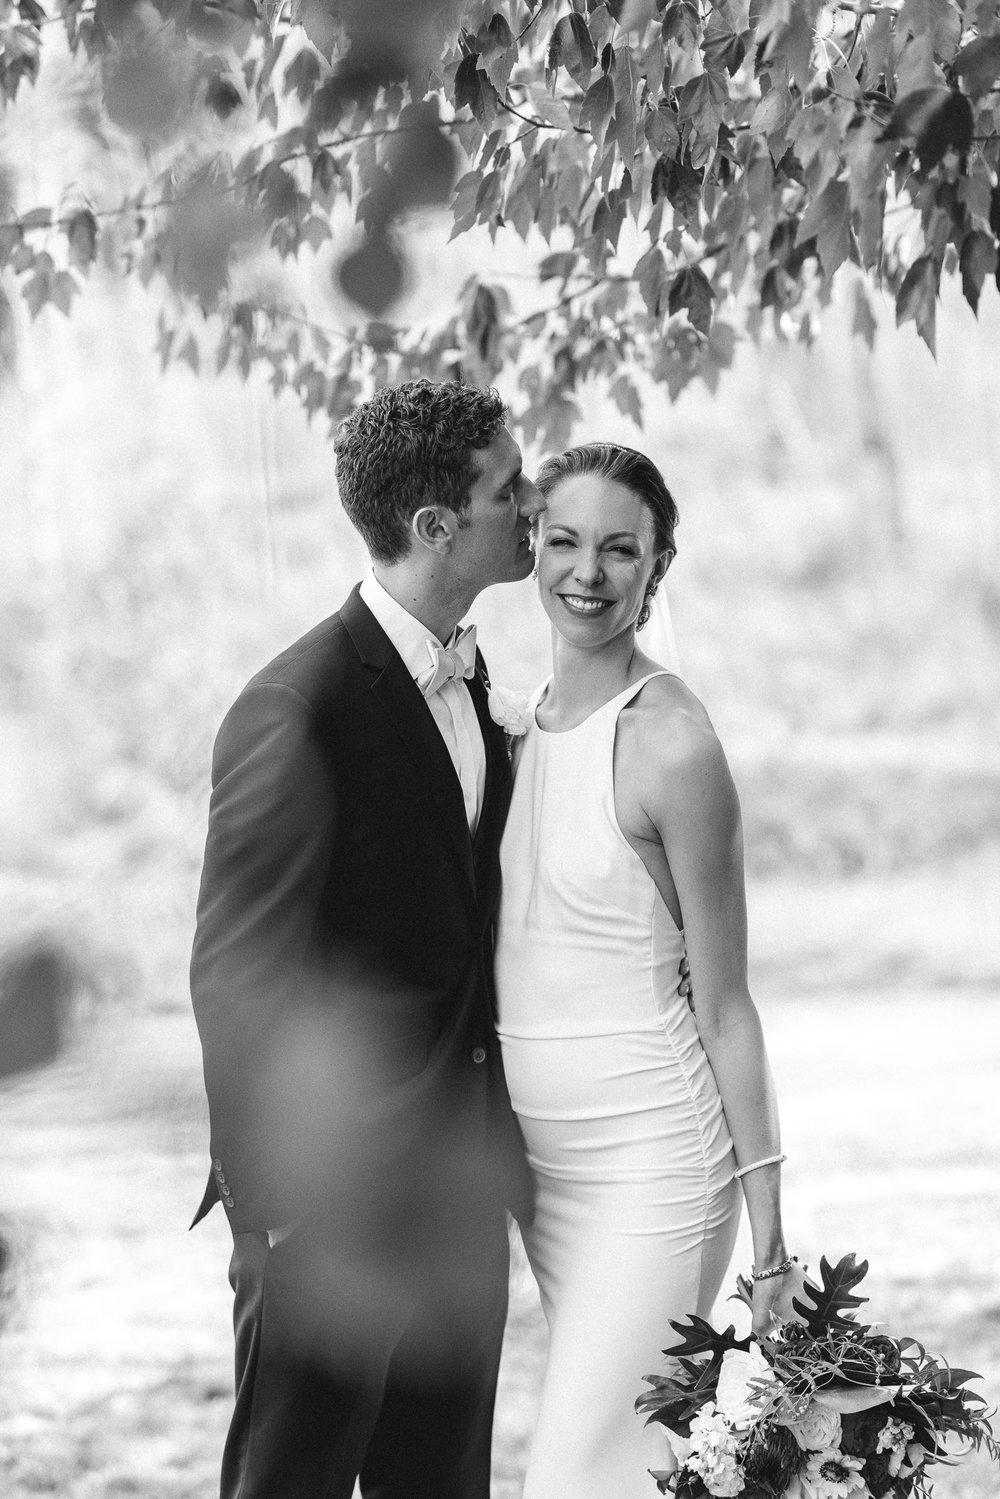 BEST_CHICAG_WEDDING_PHOTOGRAPHER_ZOE_RAIN_-43.jpg